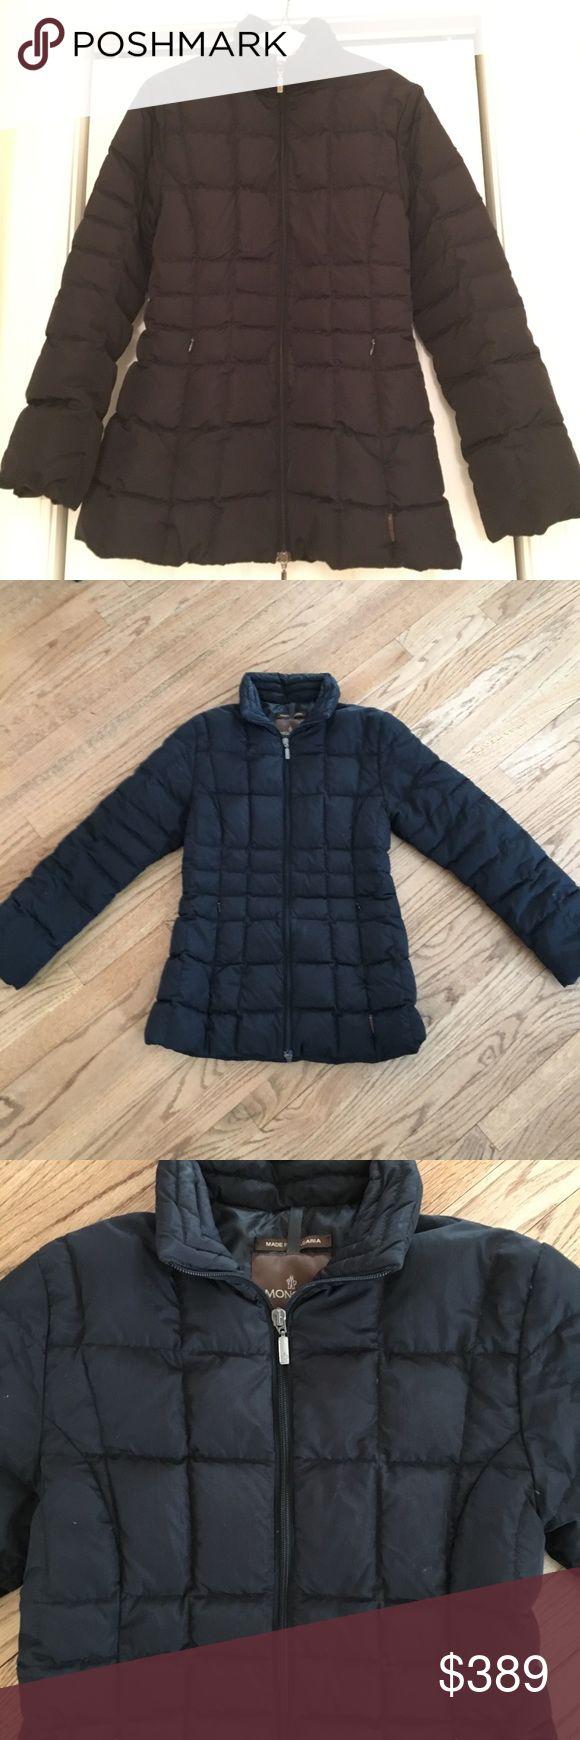 Moncler Black down puffer coat sz 0 XS Down puffer coat